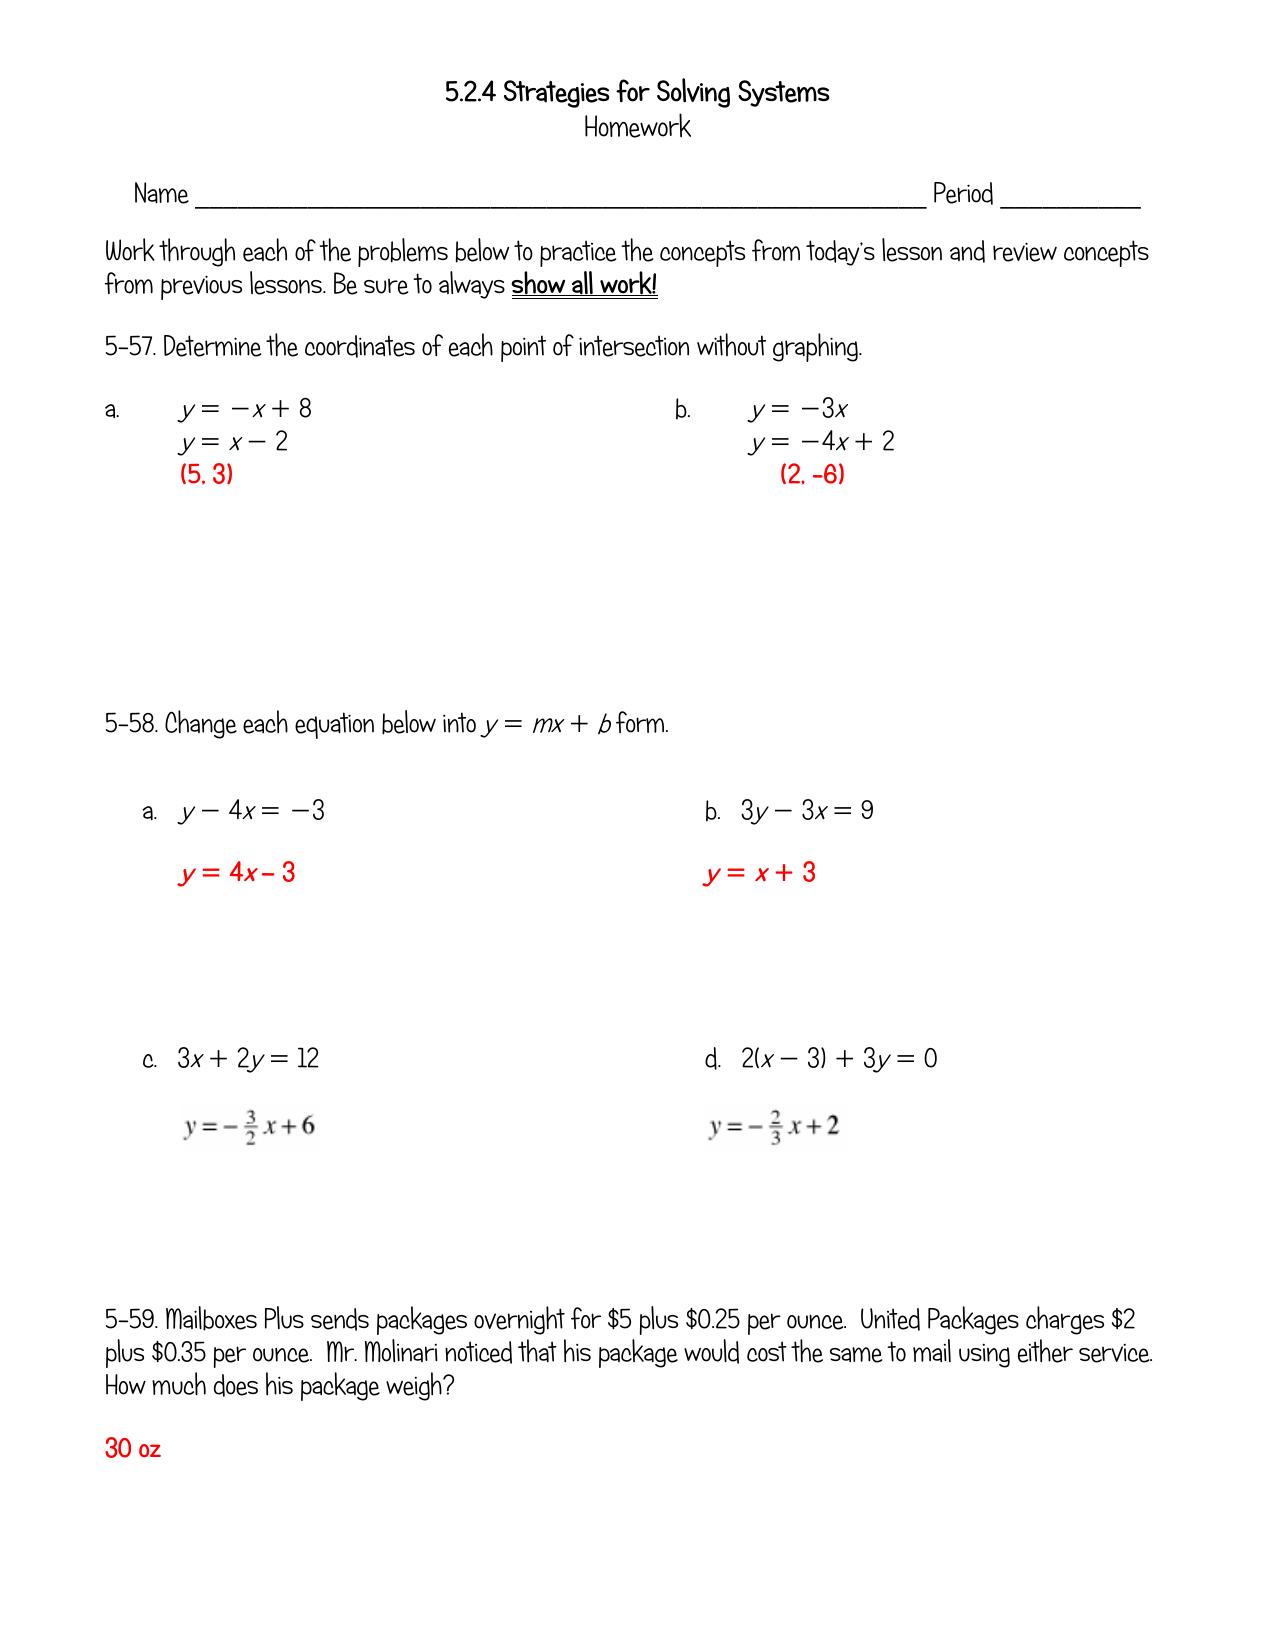 homework answer key